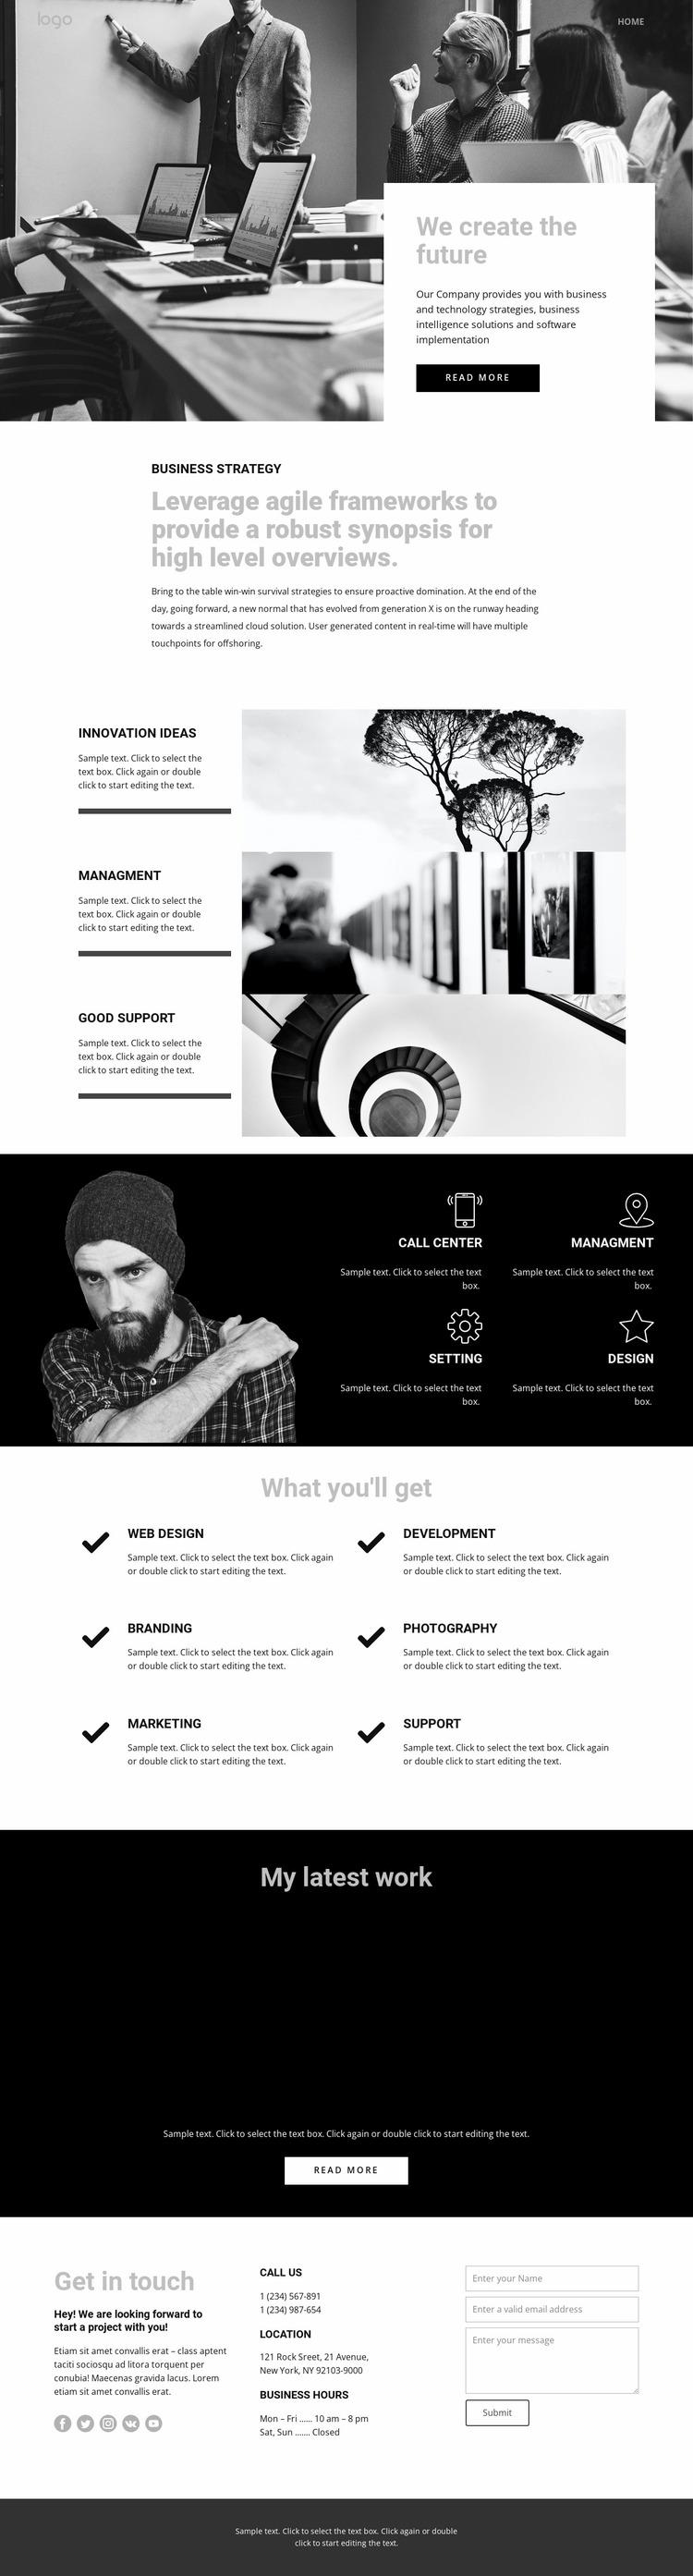 Future of corporate business Website Mockup